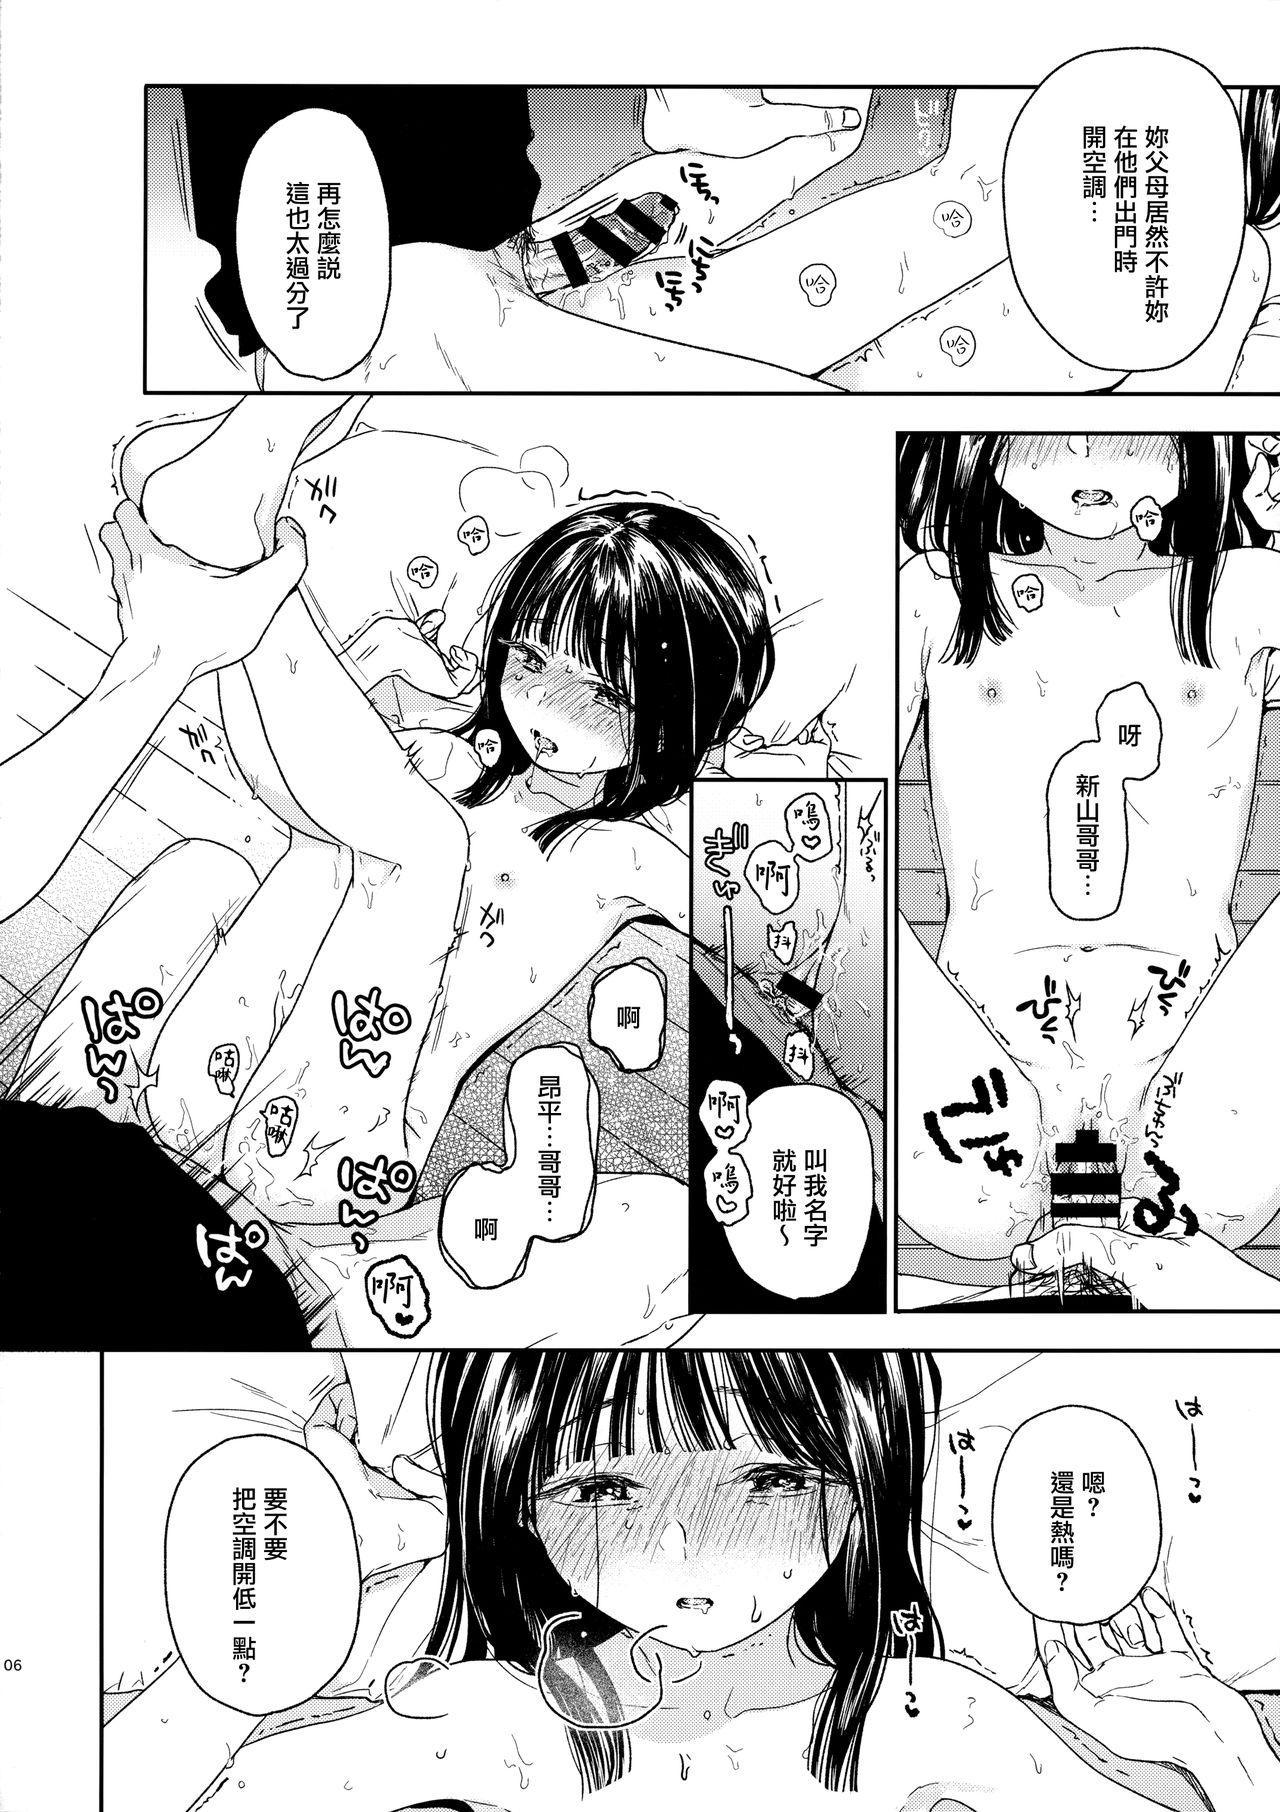 Otonari-san 5